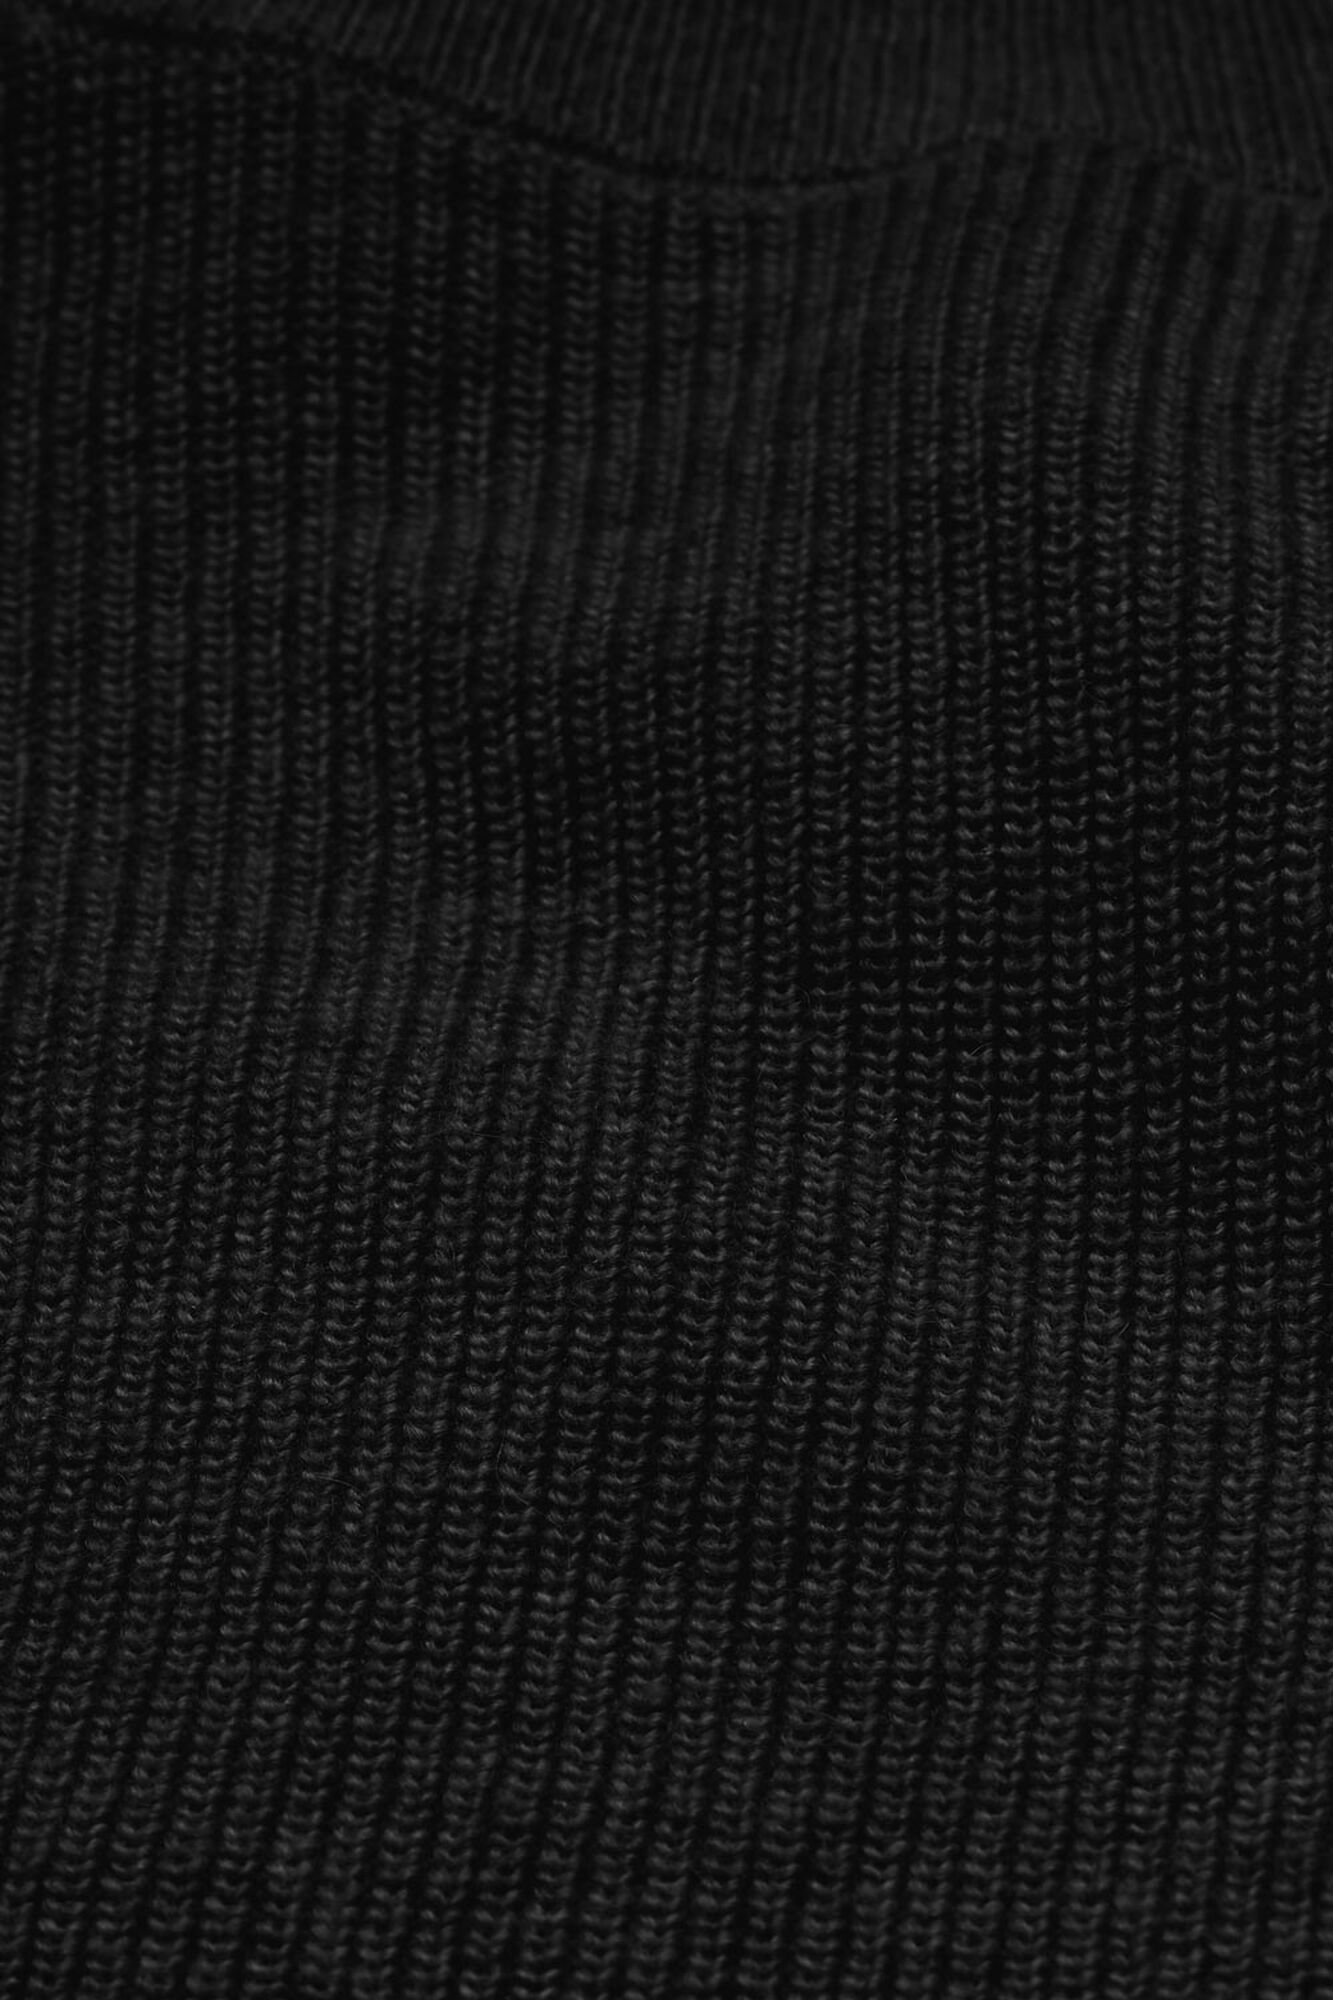 ALBA NECK WARMER, Black, hi-res